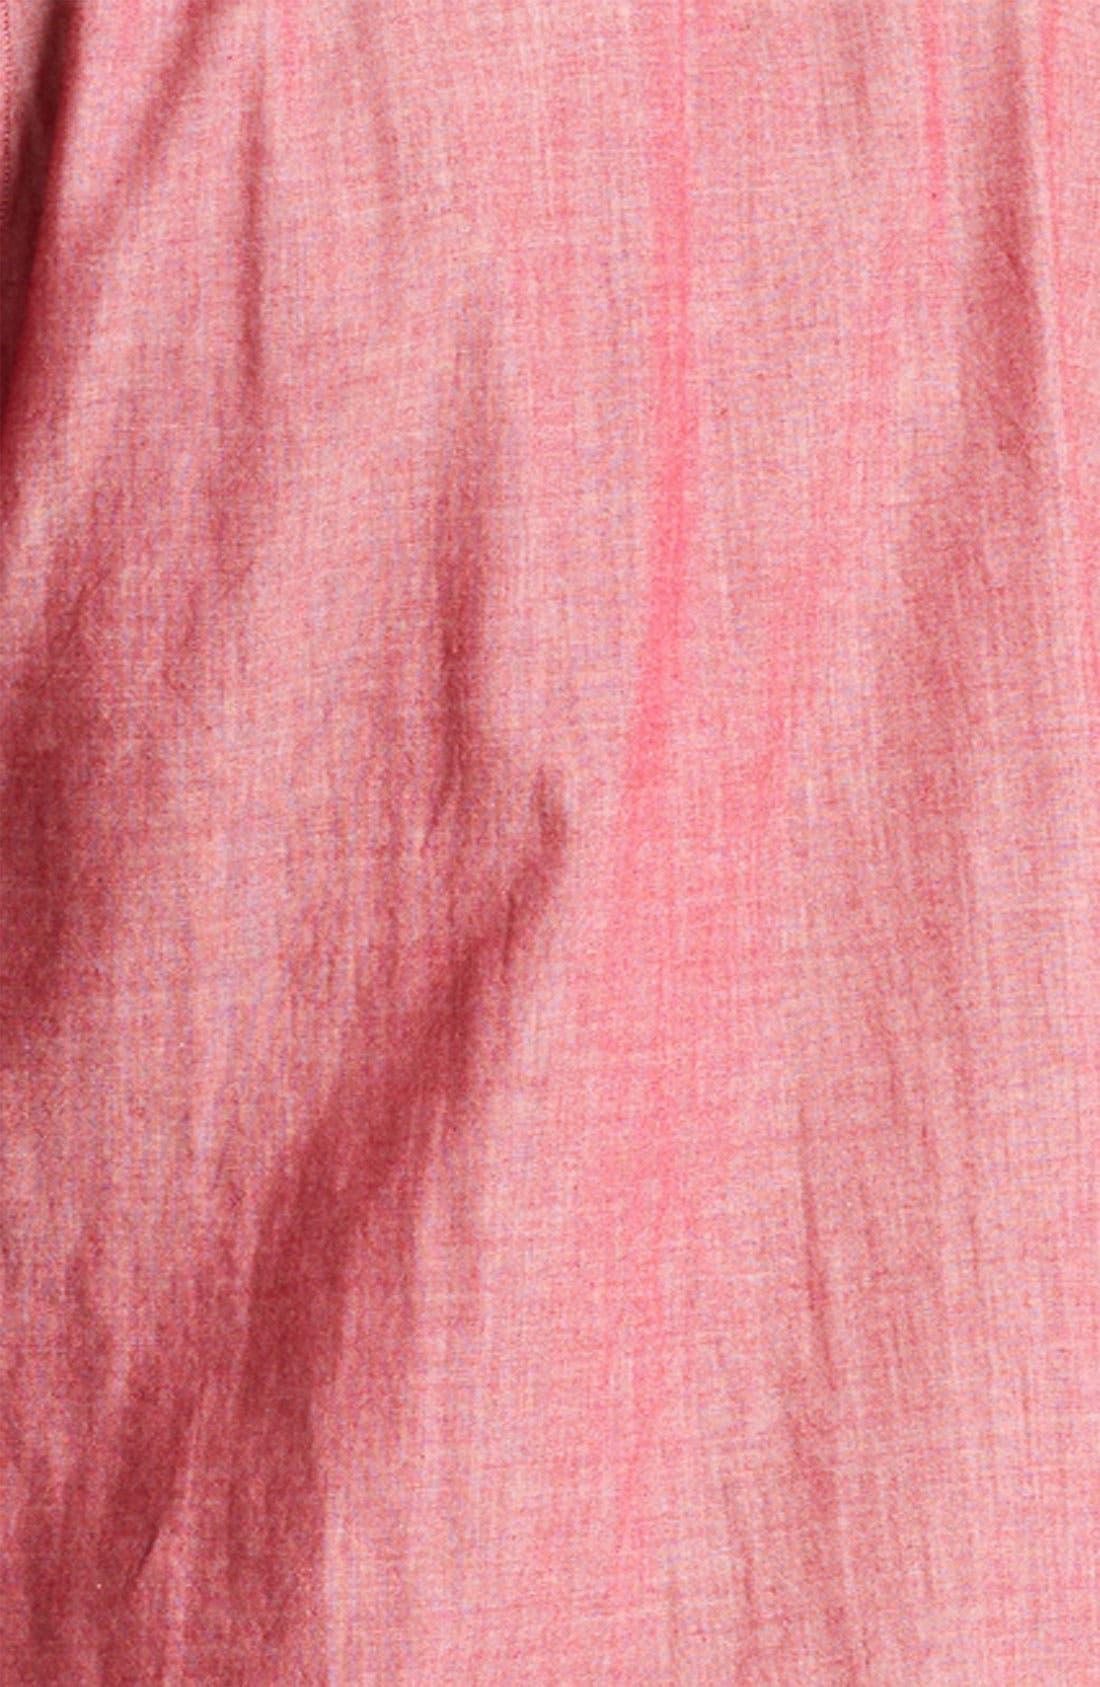 Alternate Image 3  - Shipley & Halmos 'Booster' Chambray Shirt